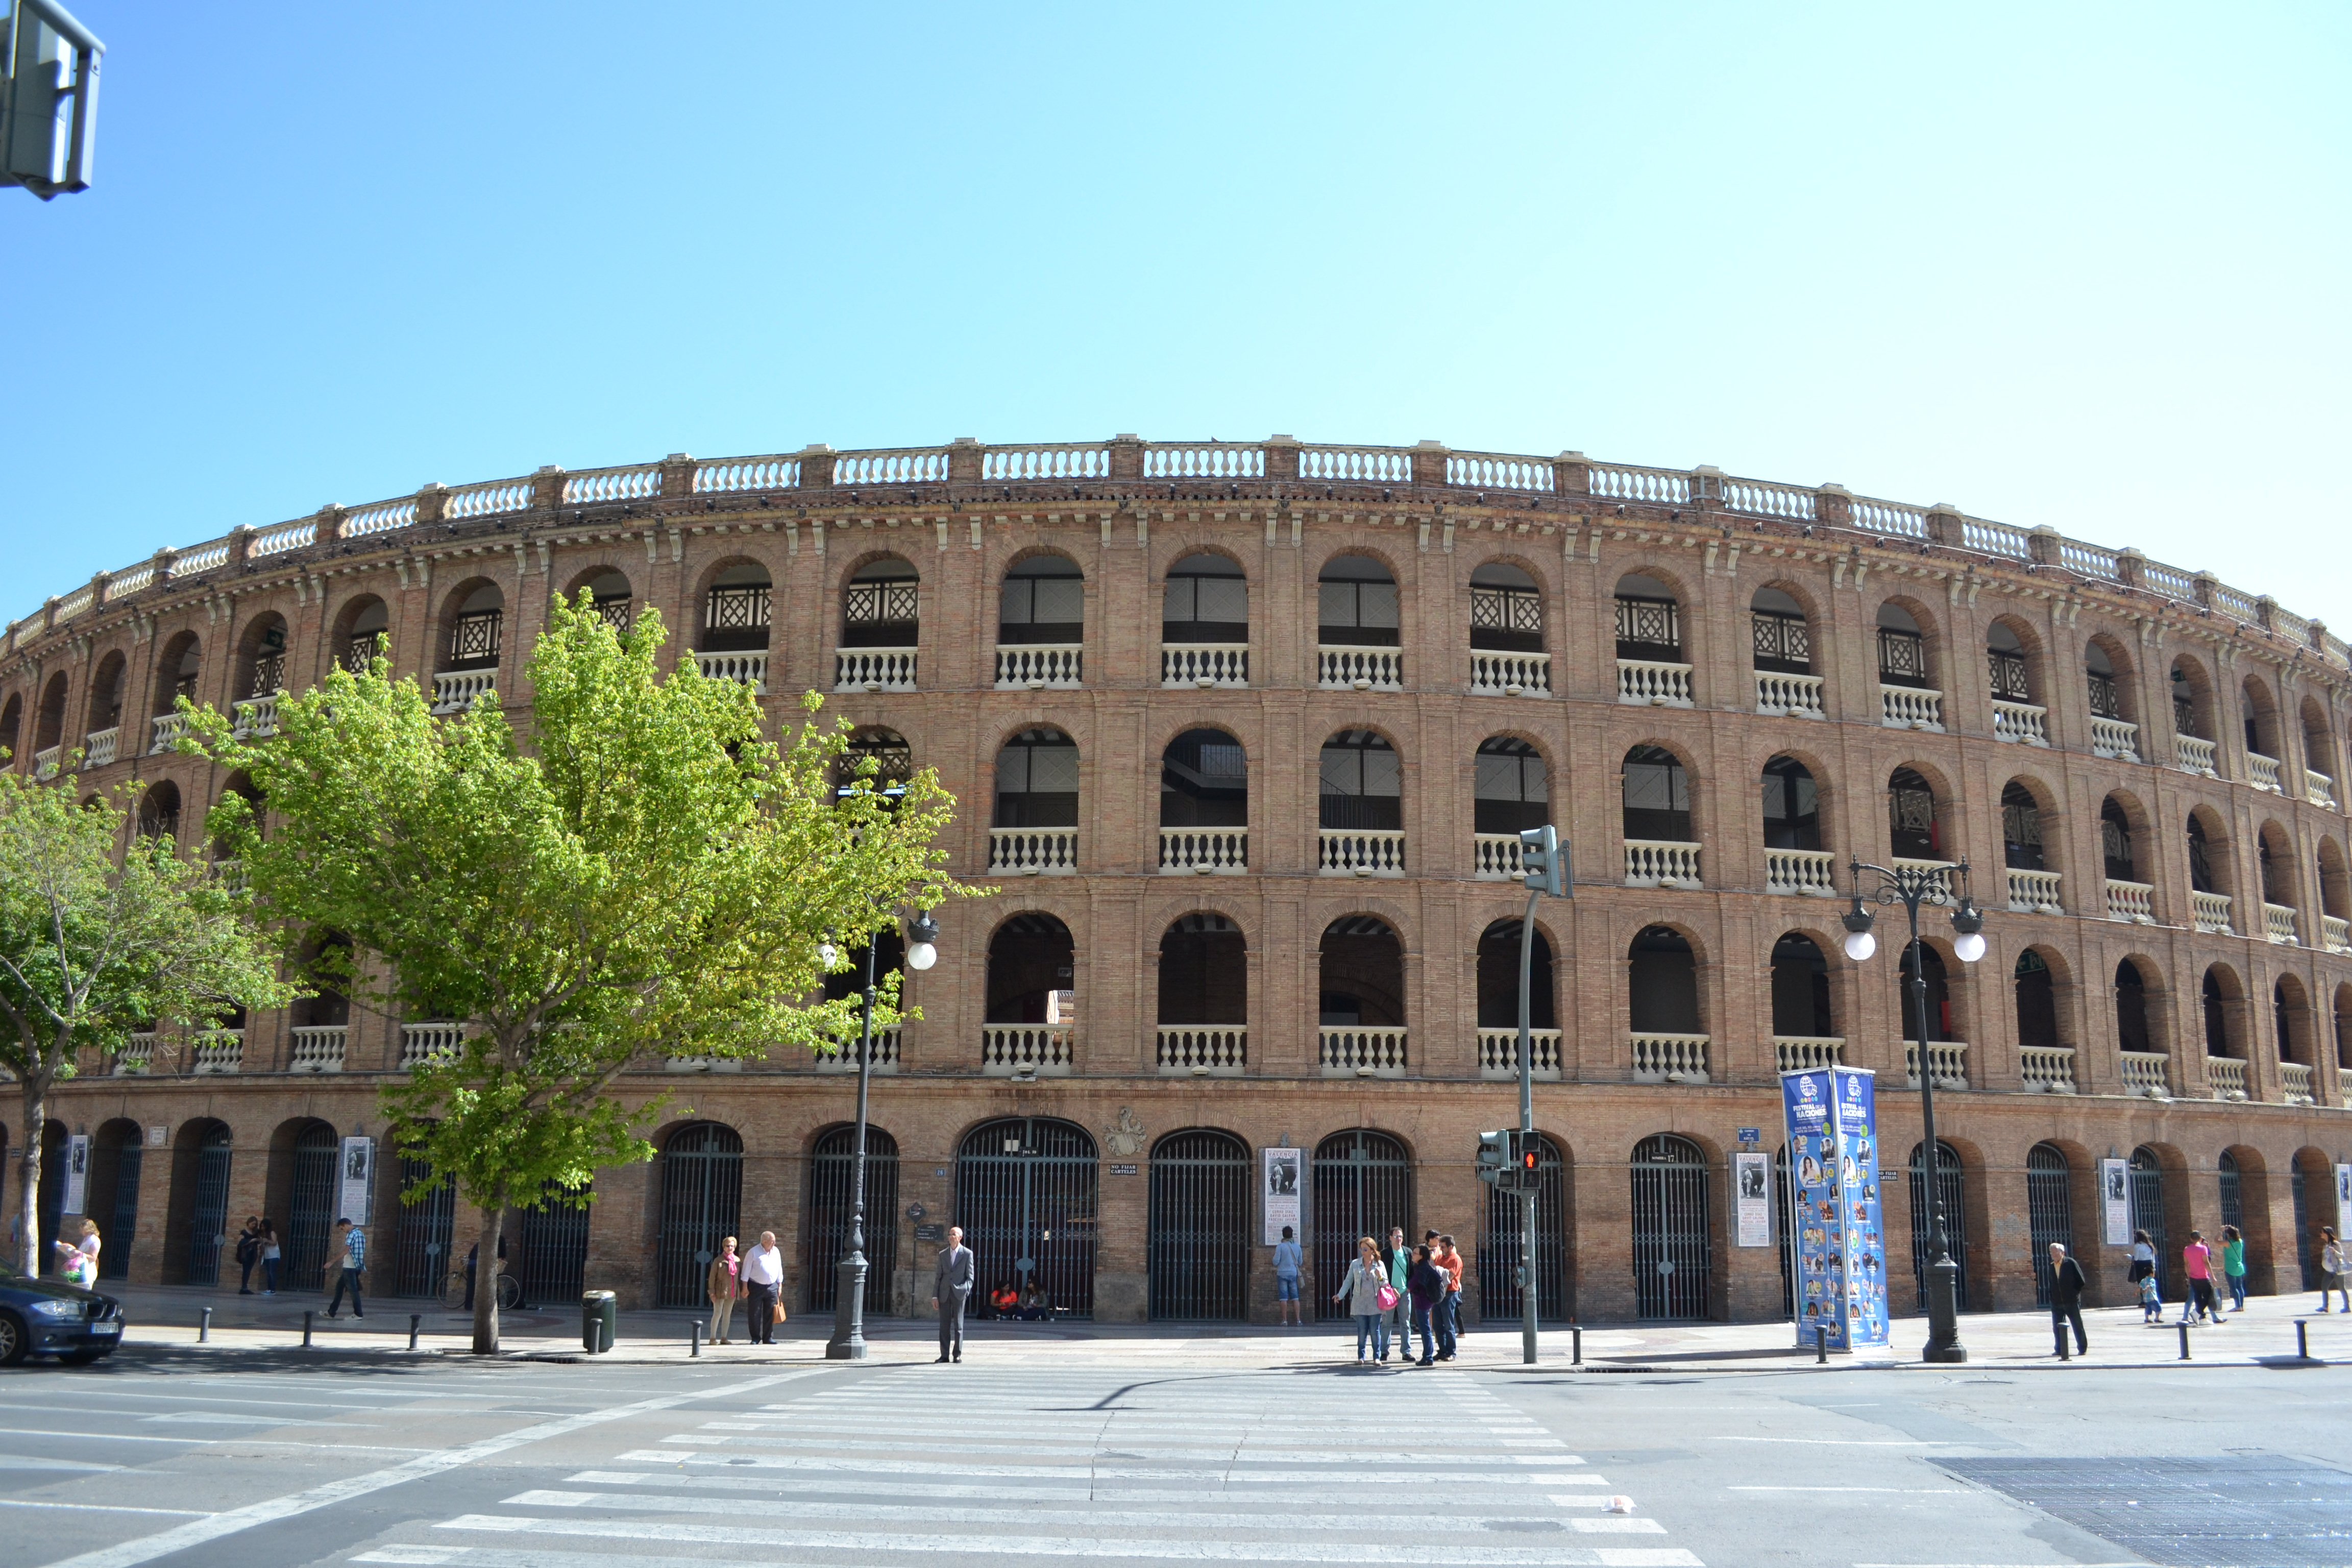 La Plaza de Toros de Valencia